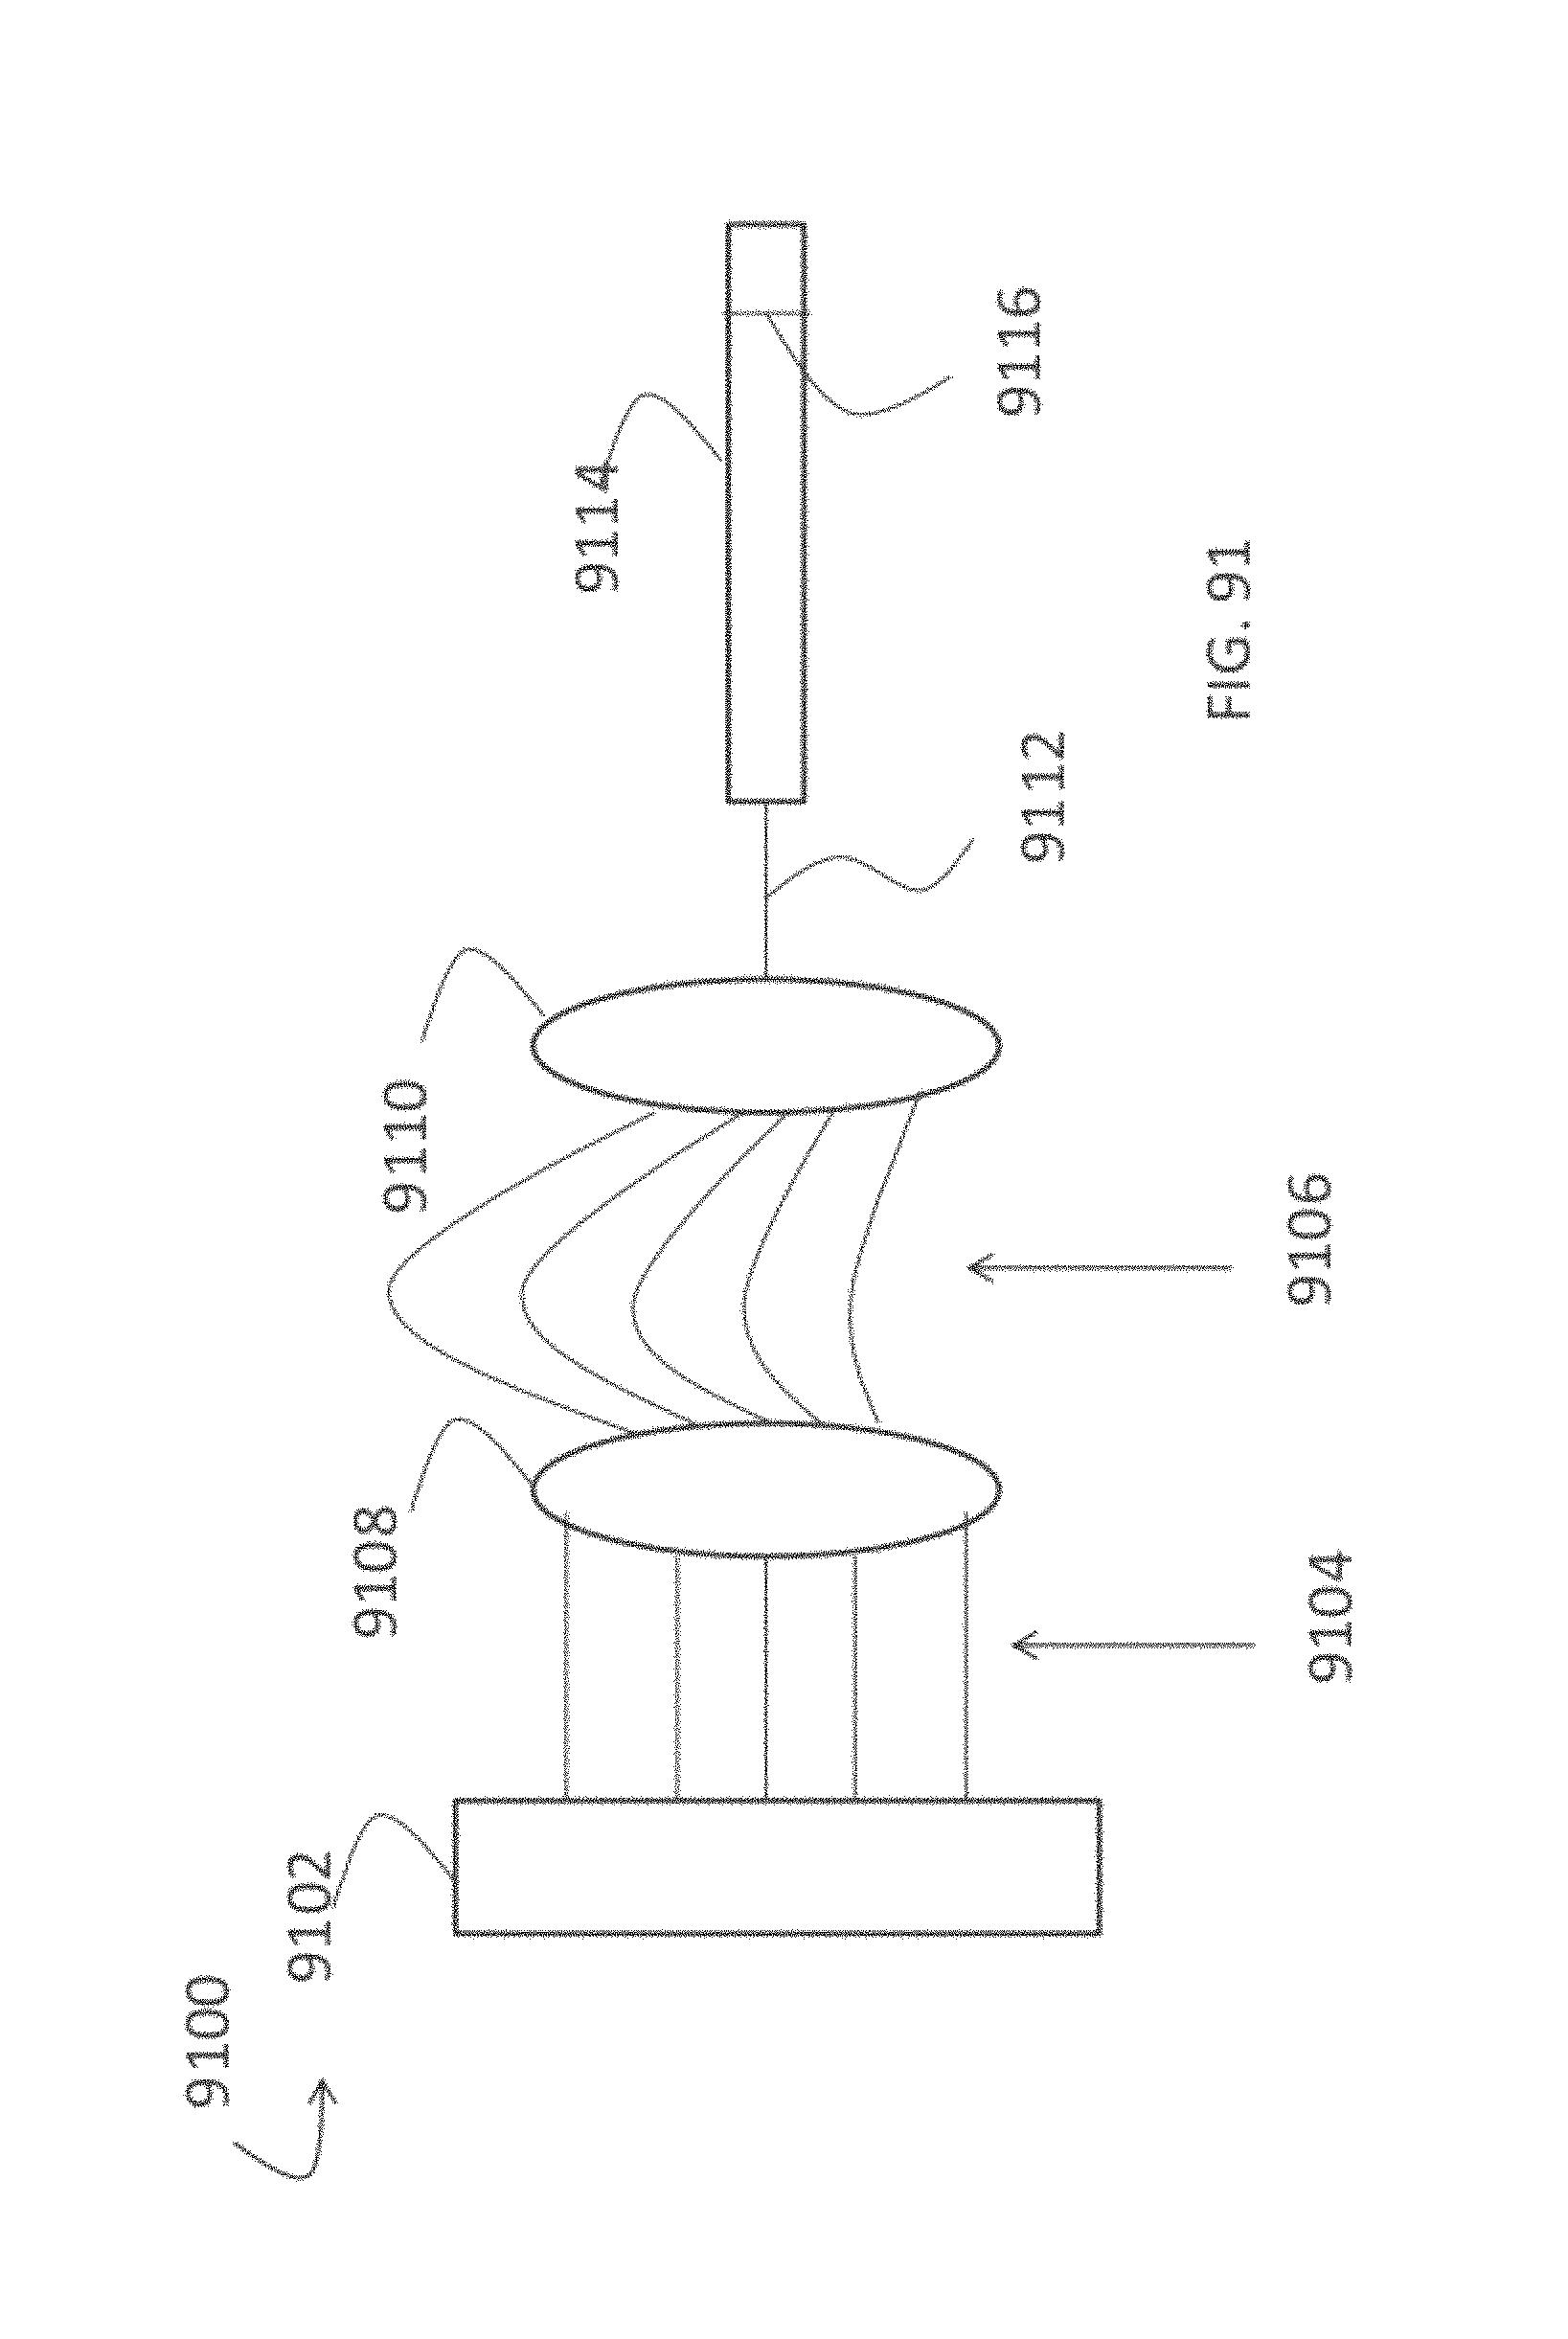 Patent US 10,180,572 B2 on